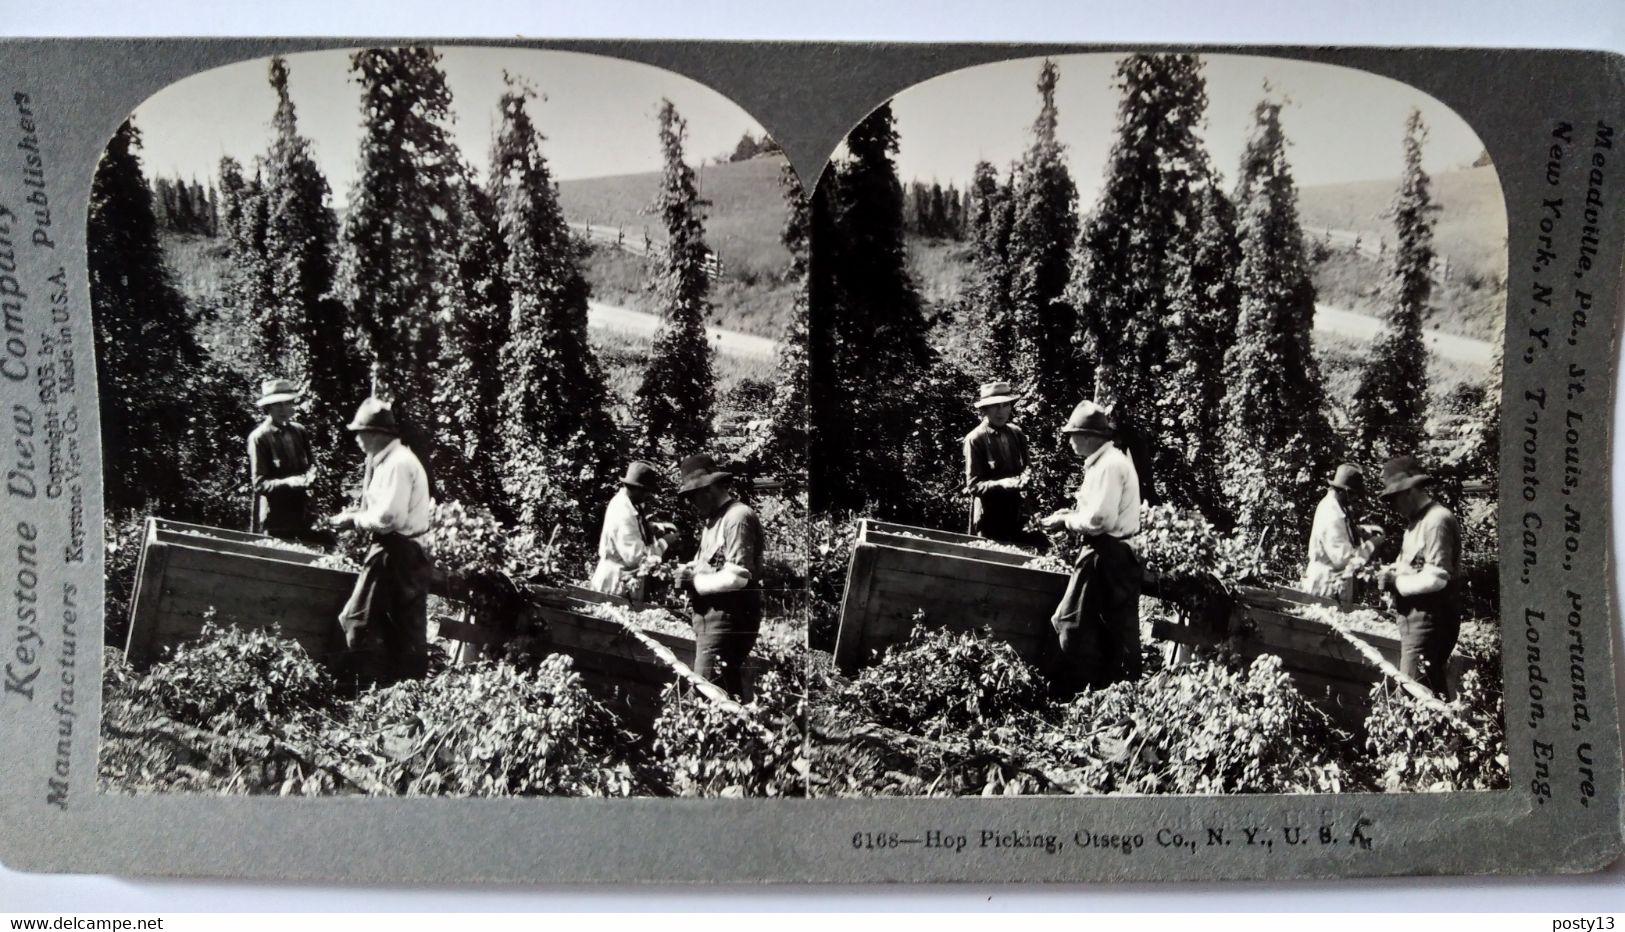 PHOTO STÉRÉO USA - Récolte Du Houblon - Agriculture - 1905 - Ed. Keystone TBE - Stereoscopio